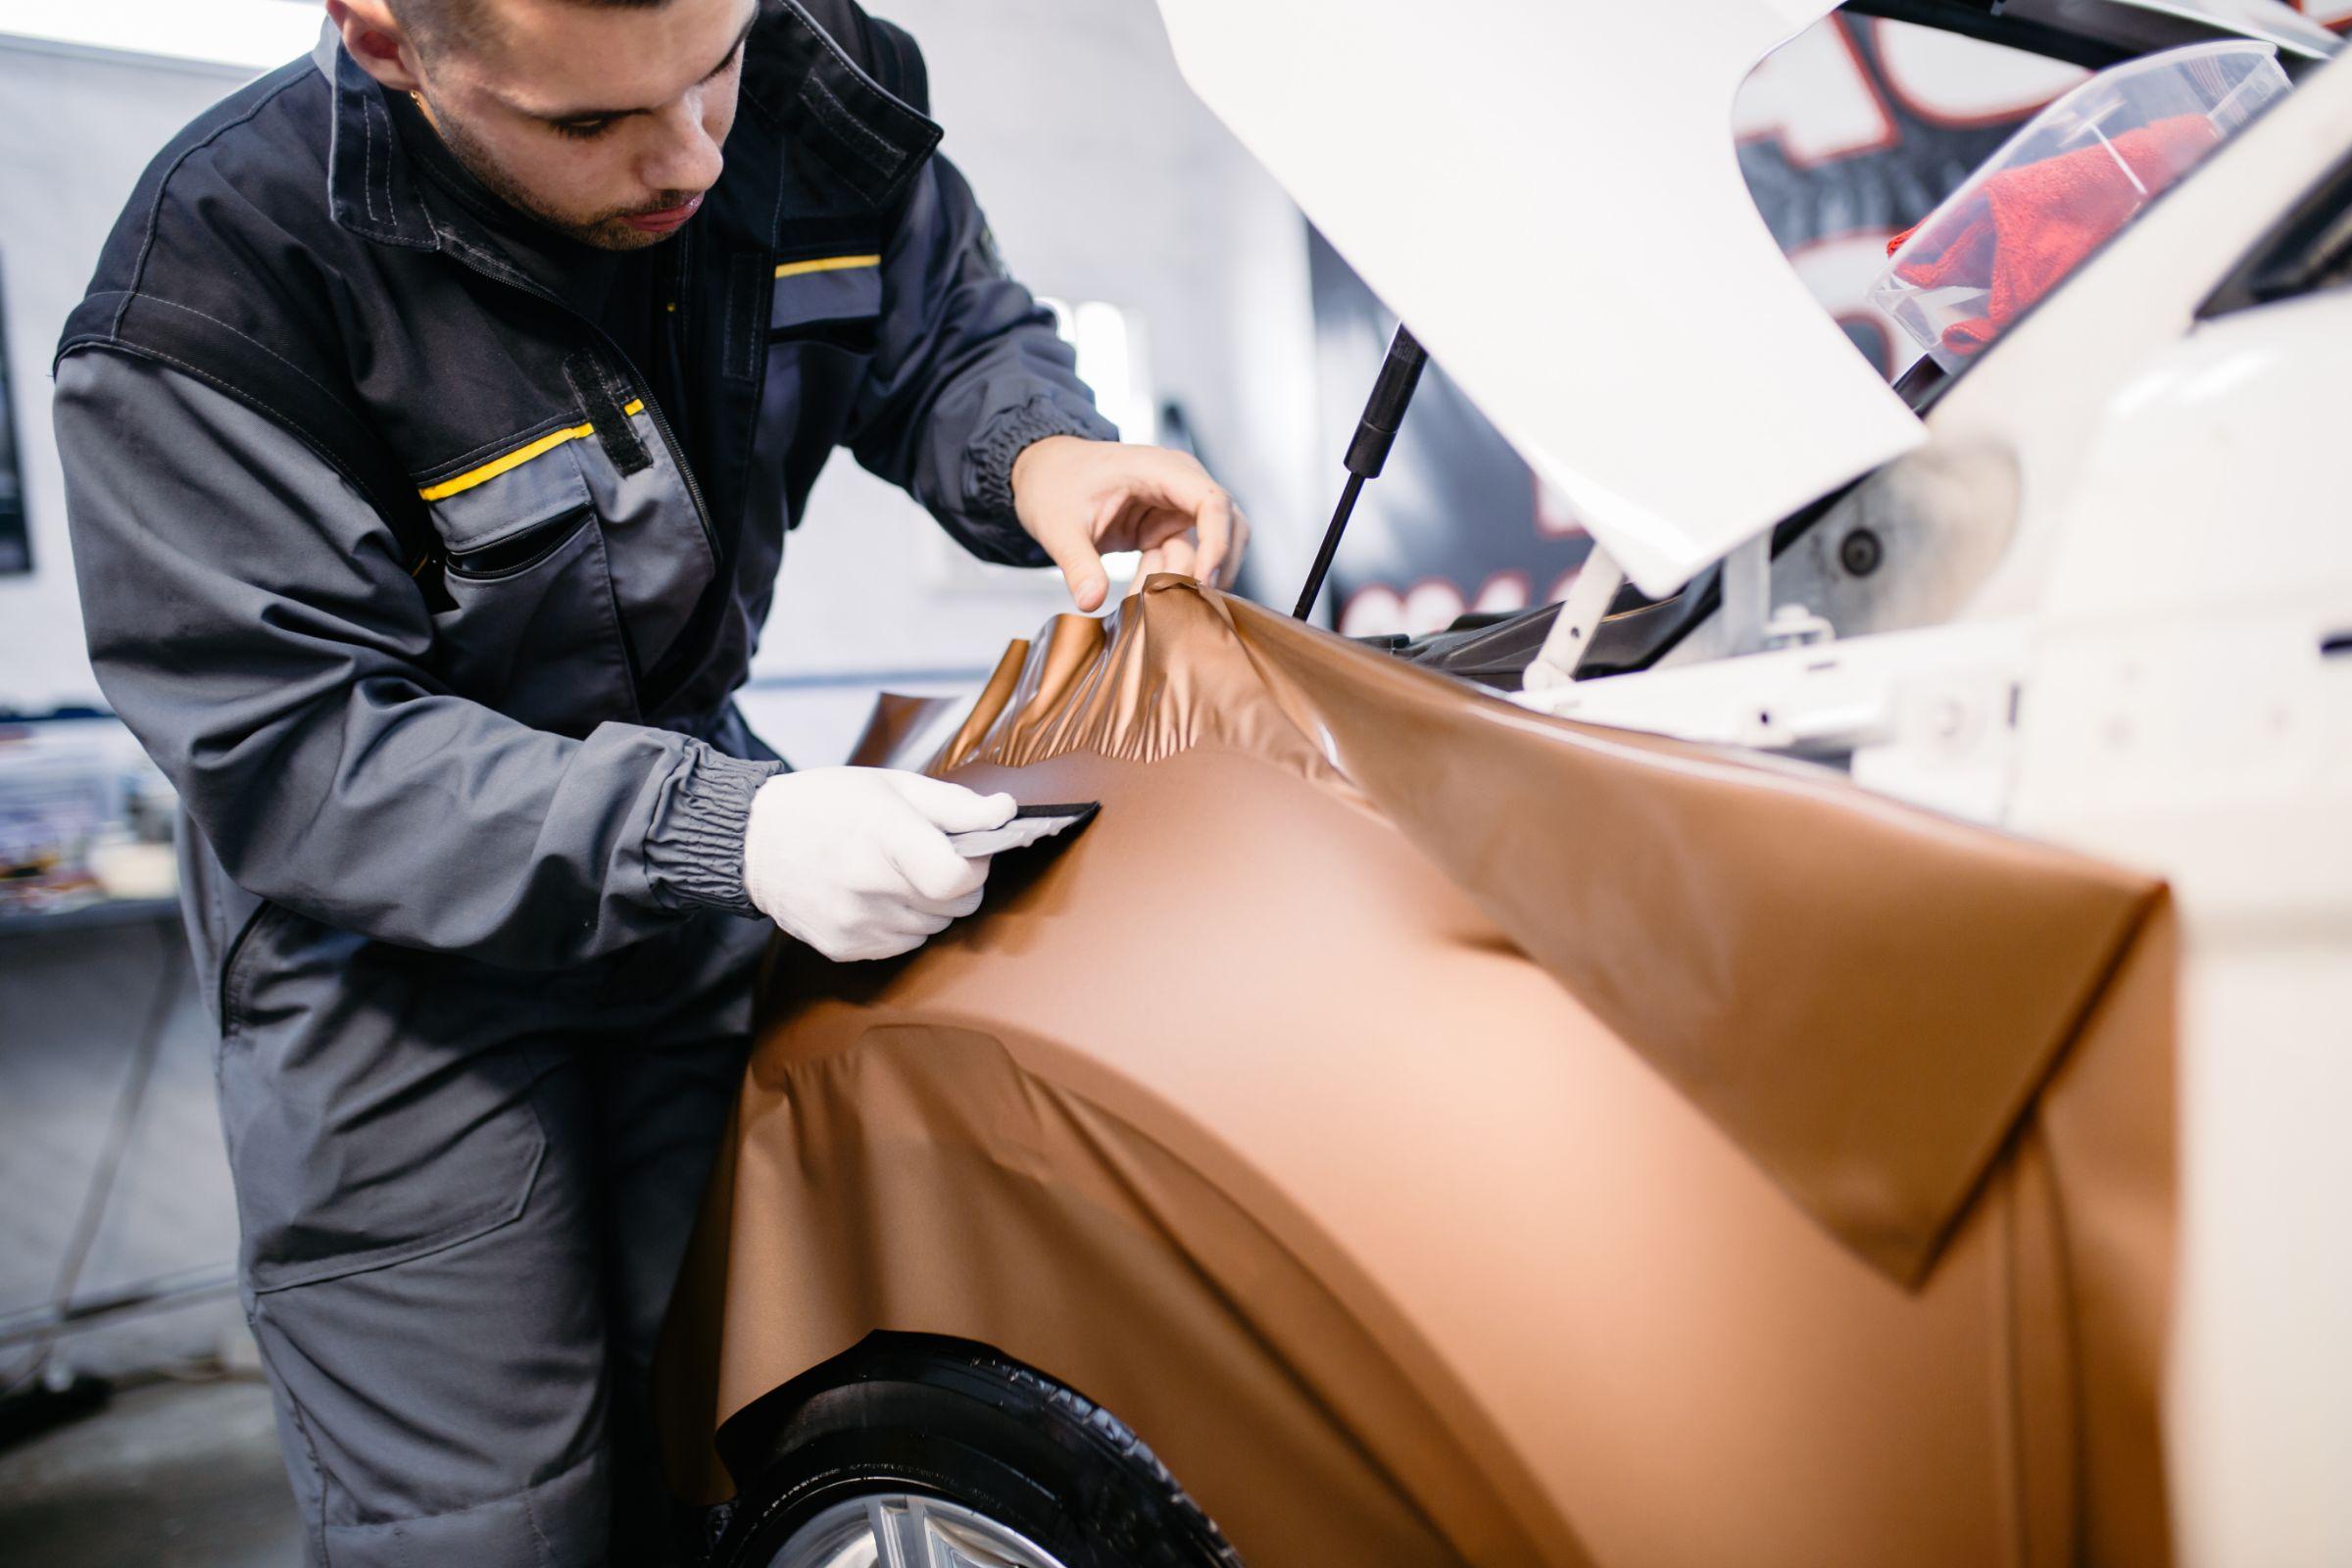 envelopamento de carros shutterstock 2